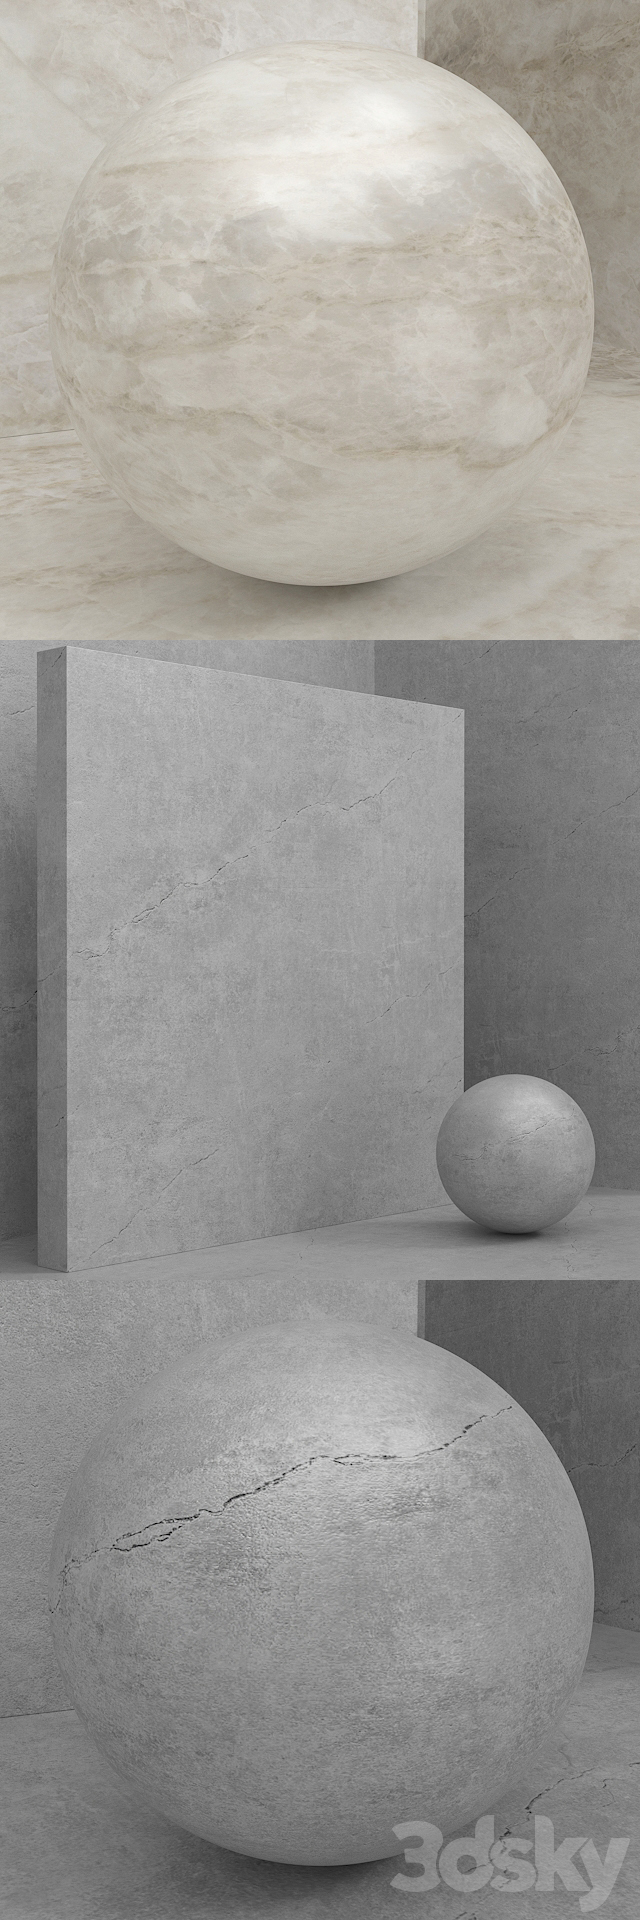 Material (seamless) - stone - Cosentino Dekton set 101